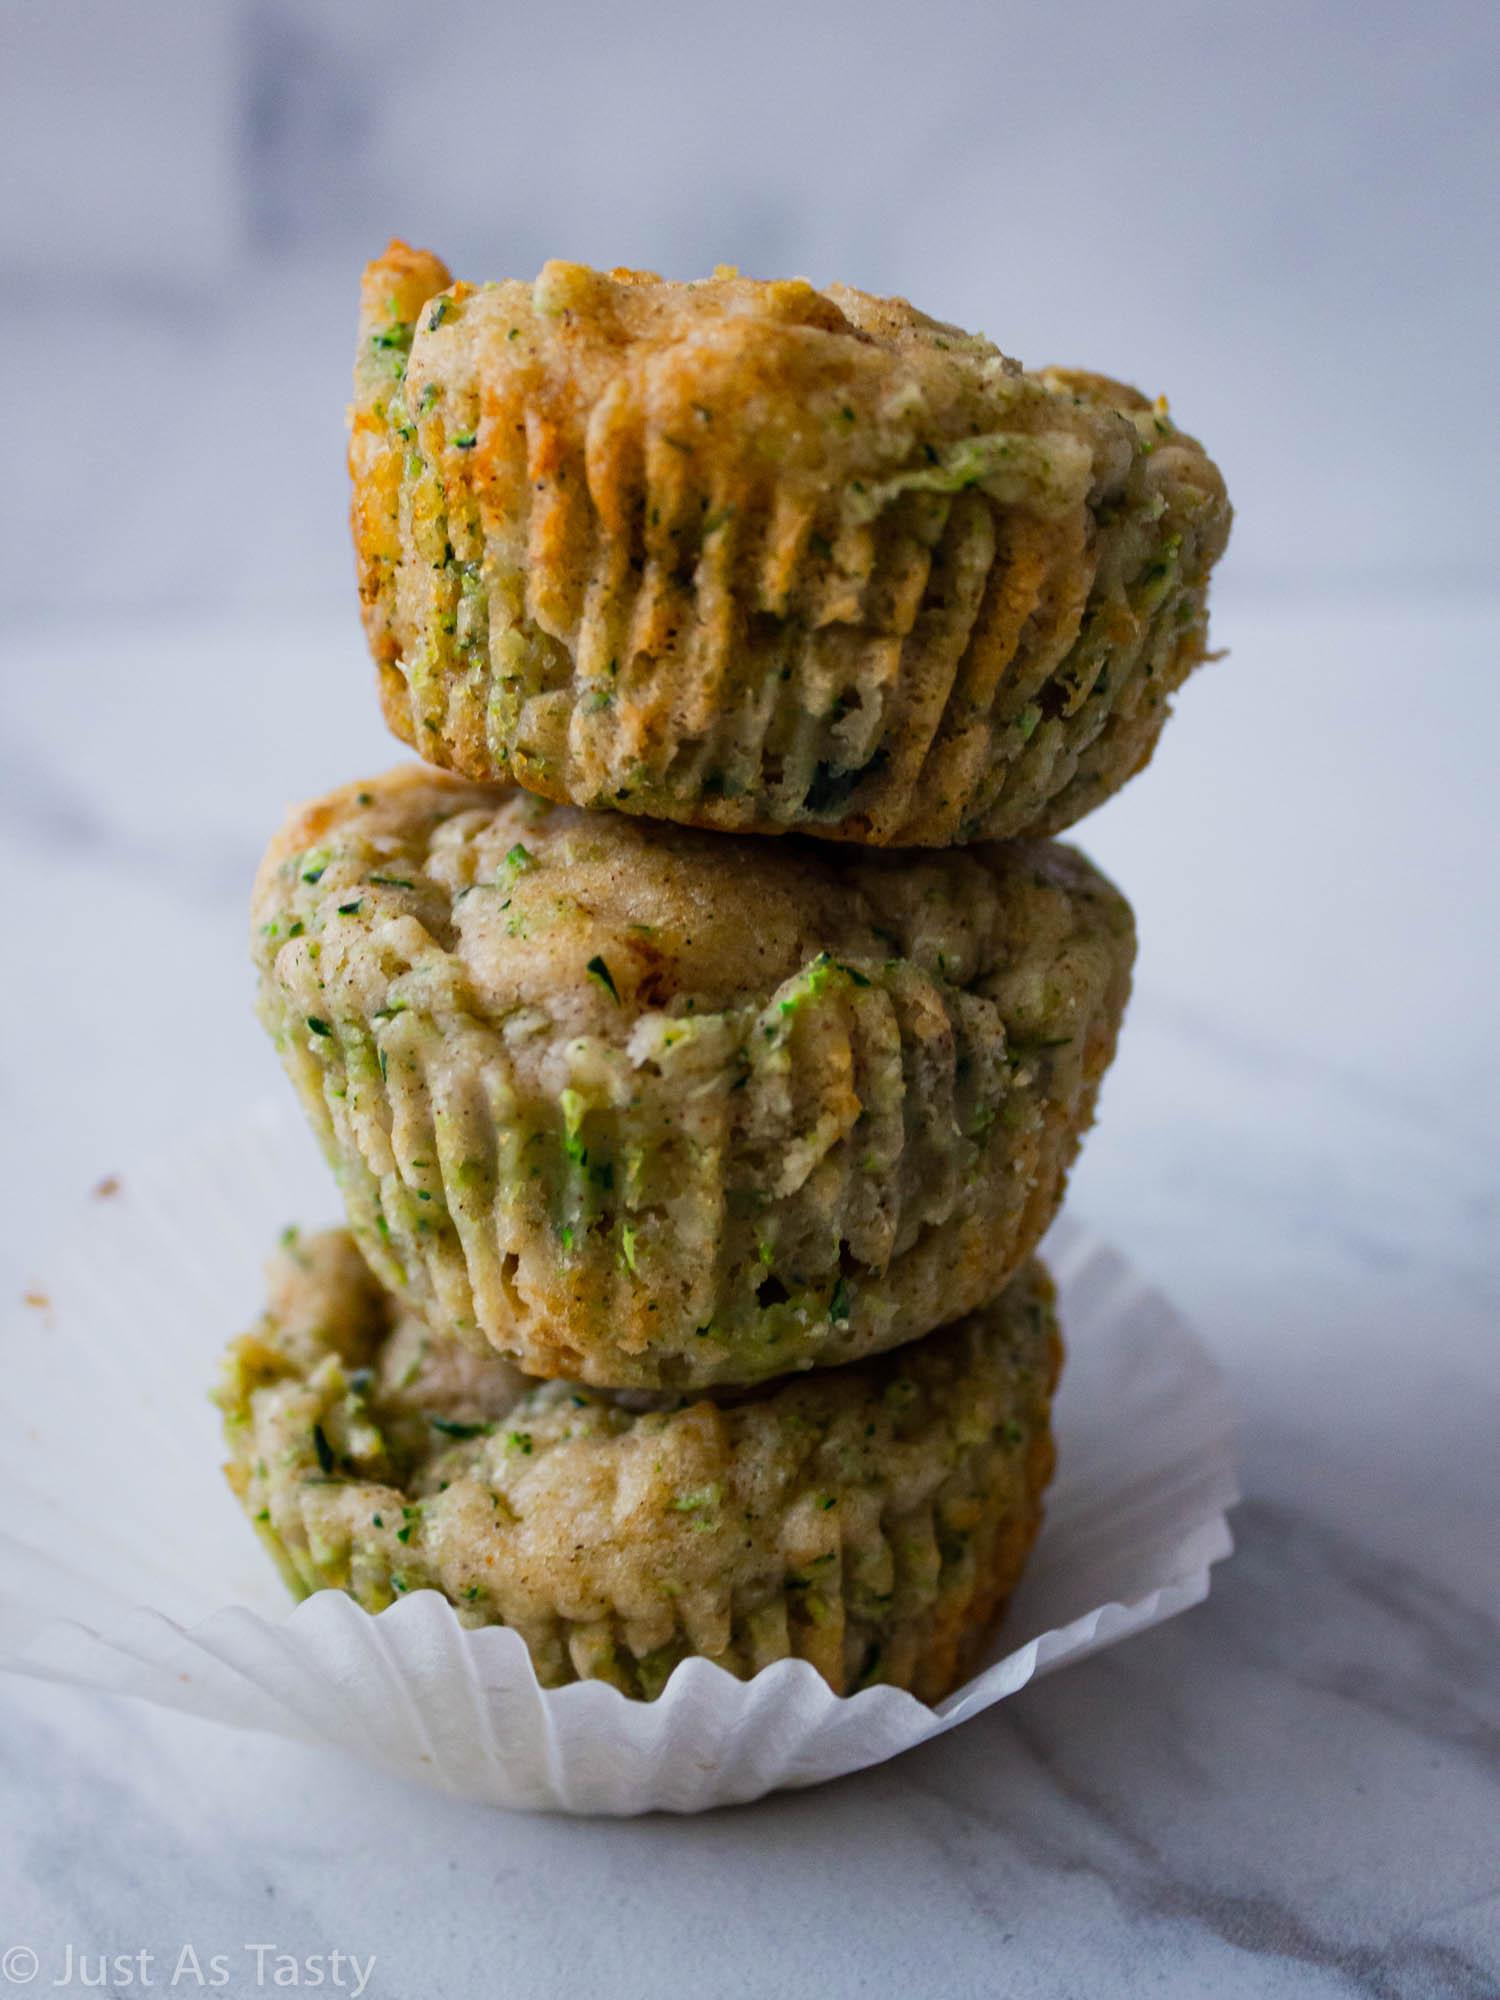 Stack of three gluten free zucchini muffins.